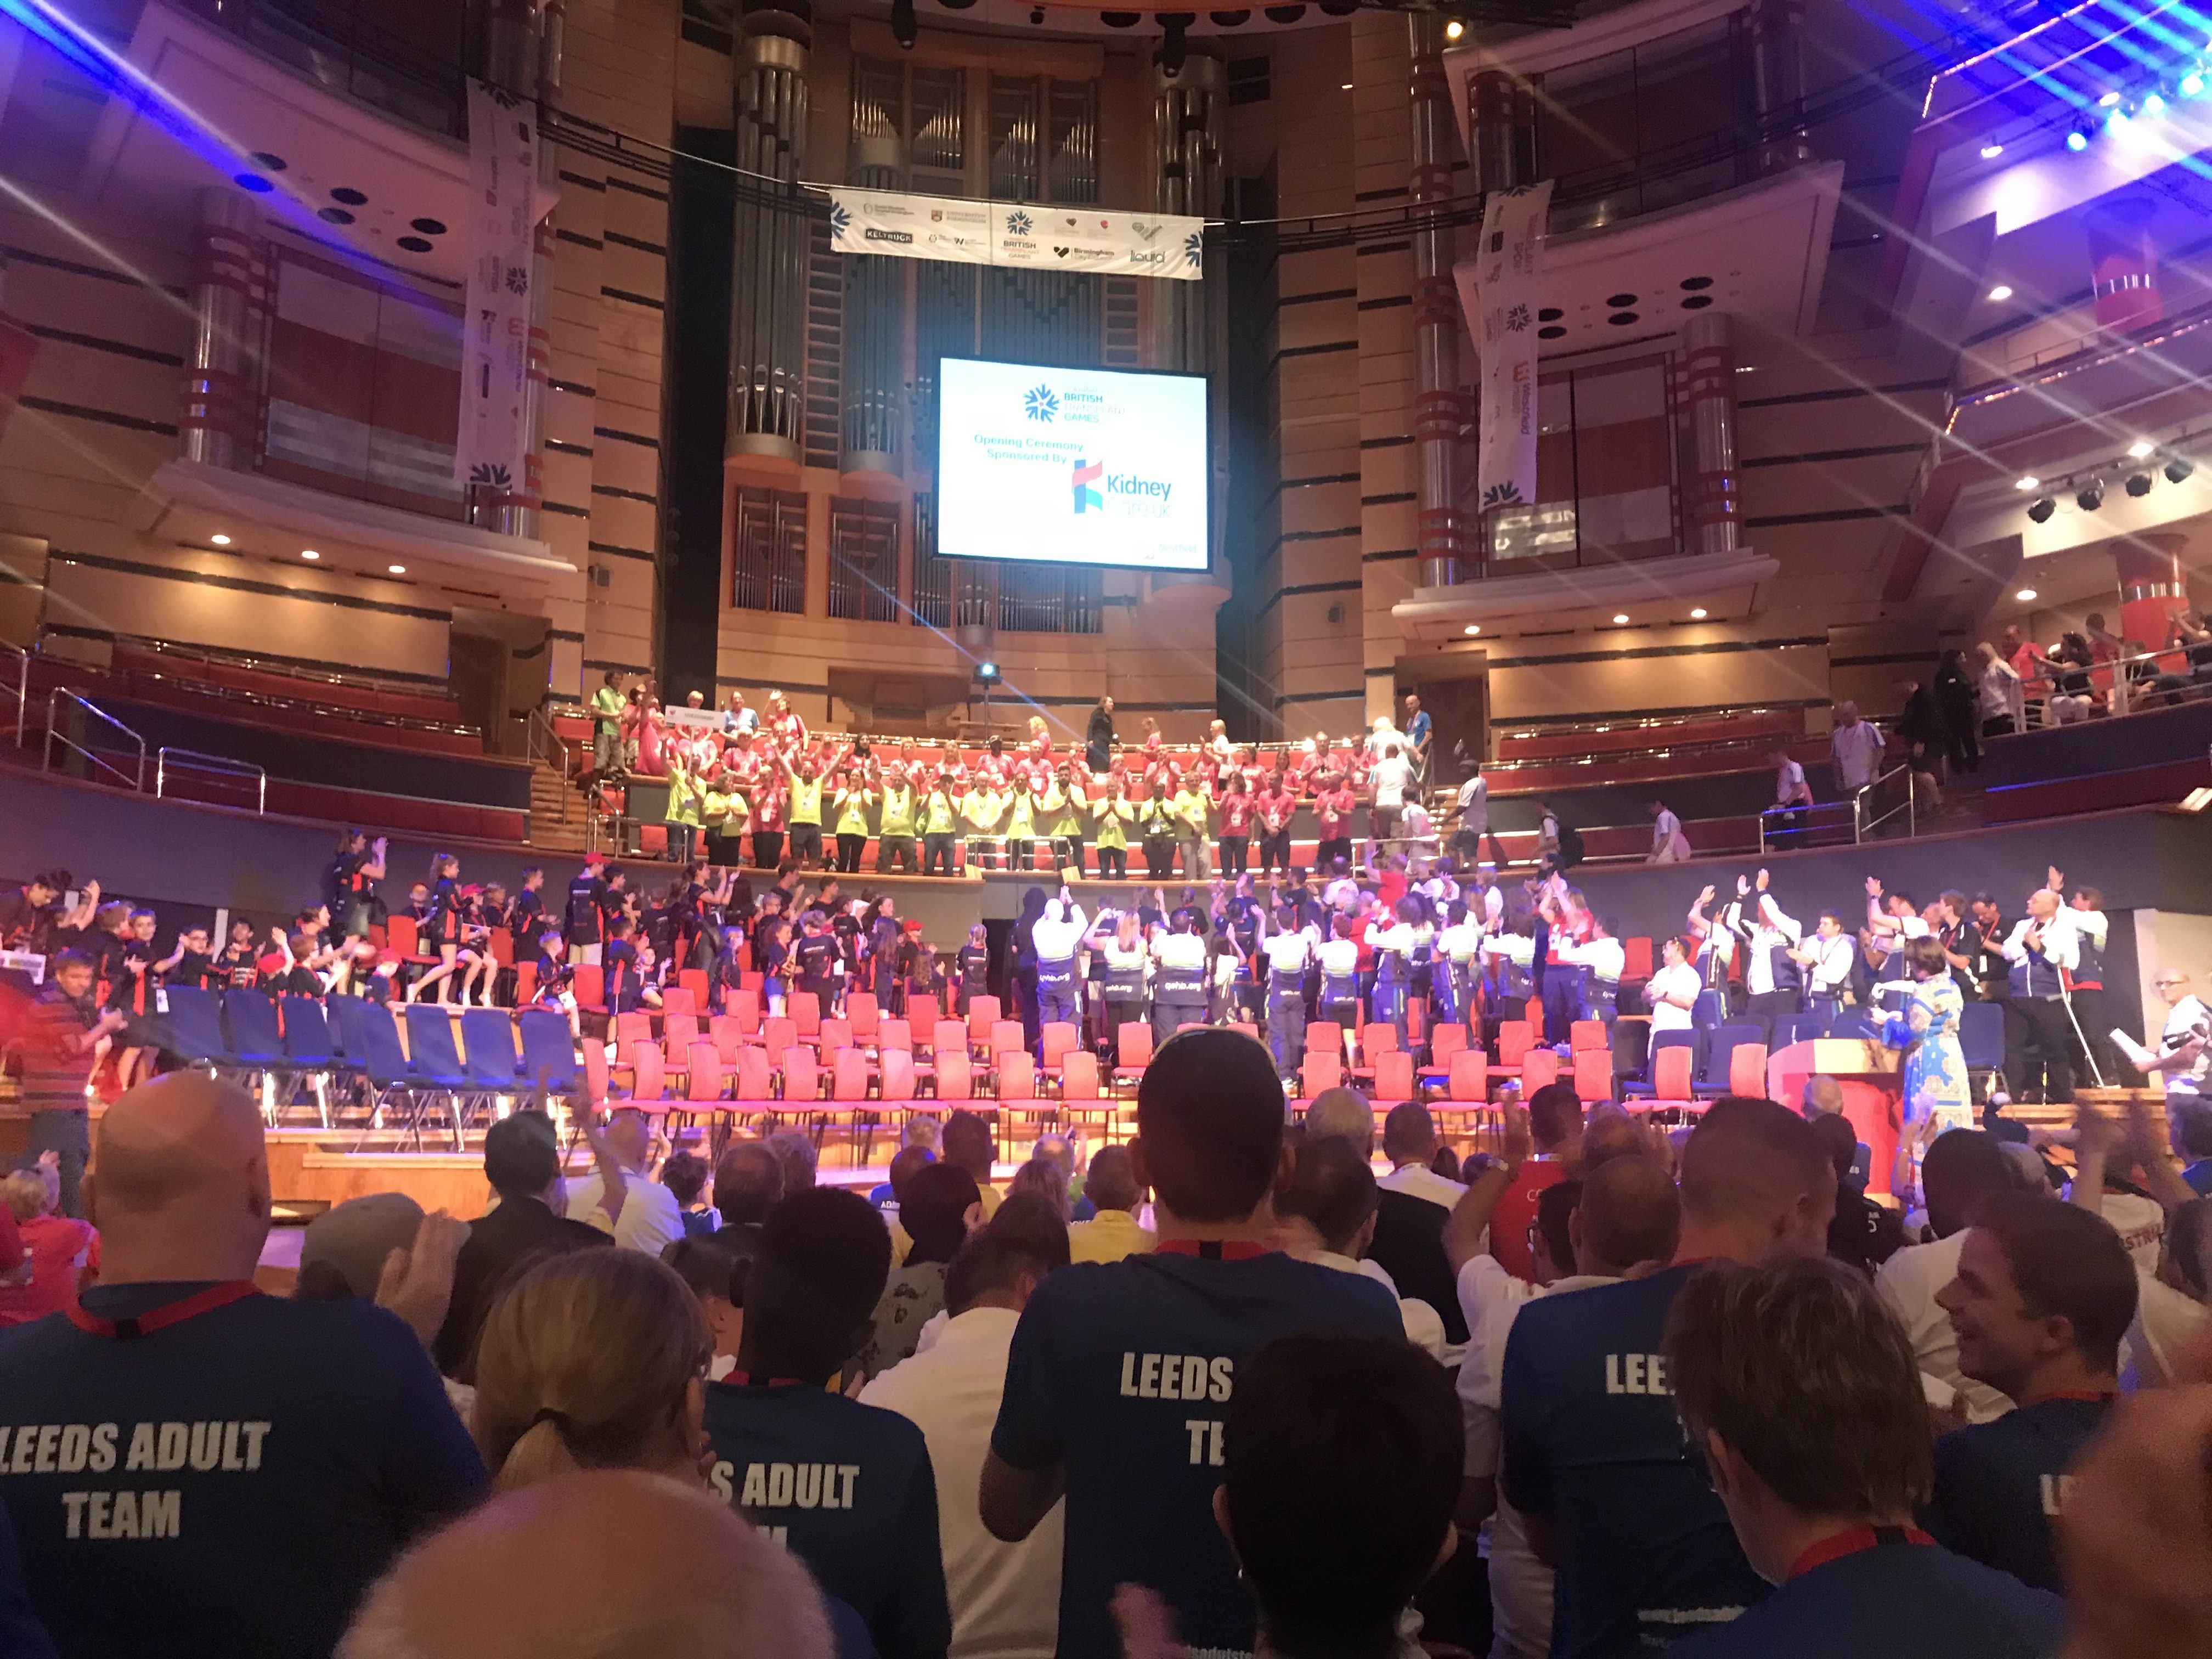 2018 British Transplant Games